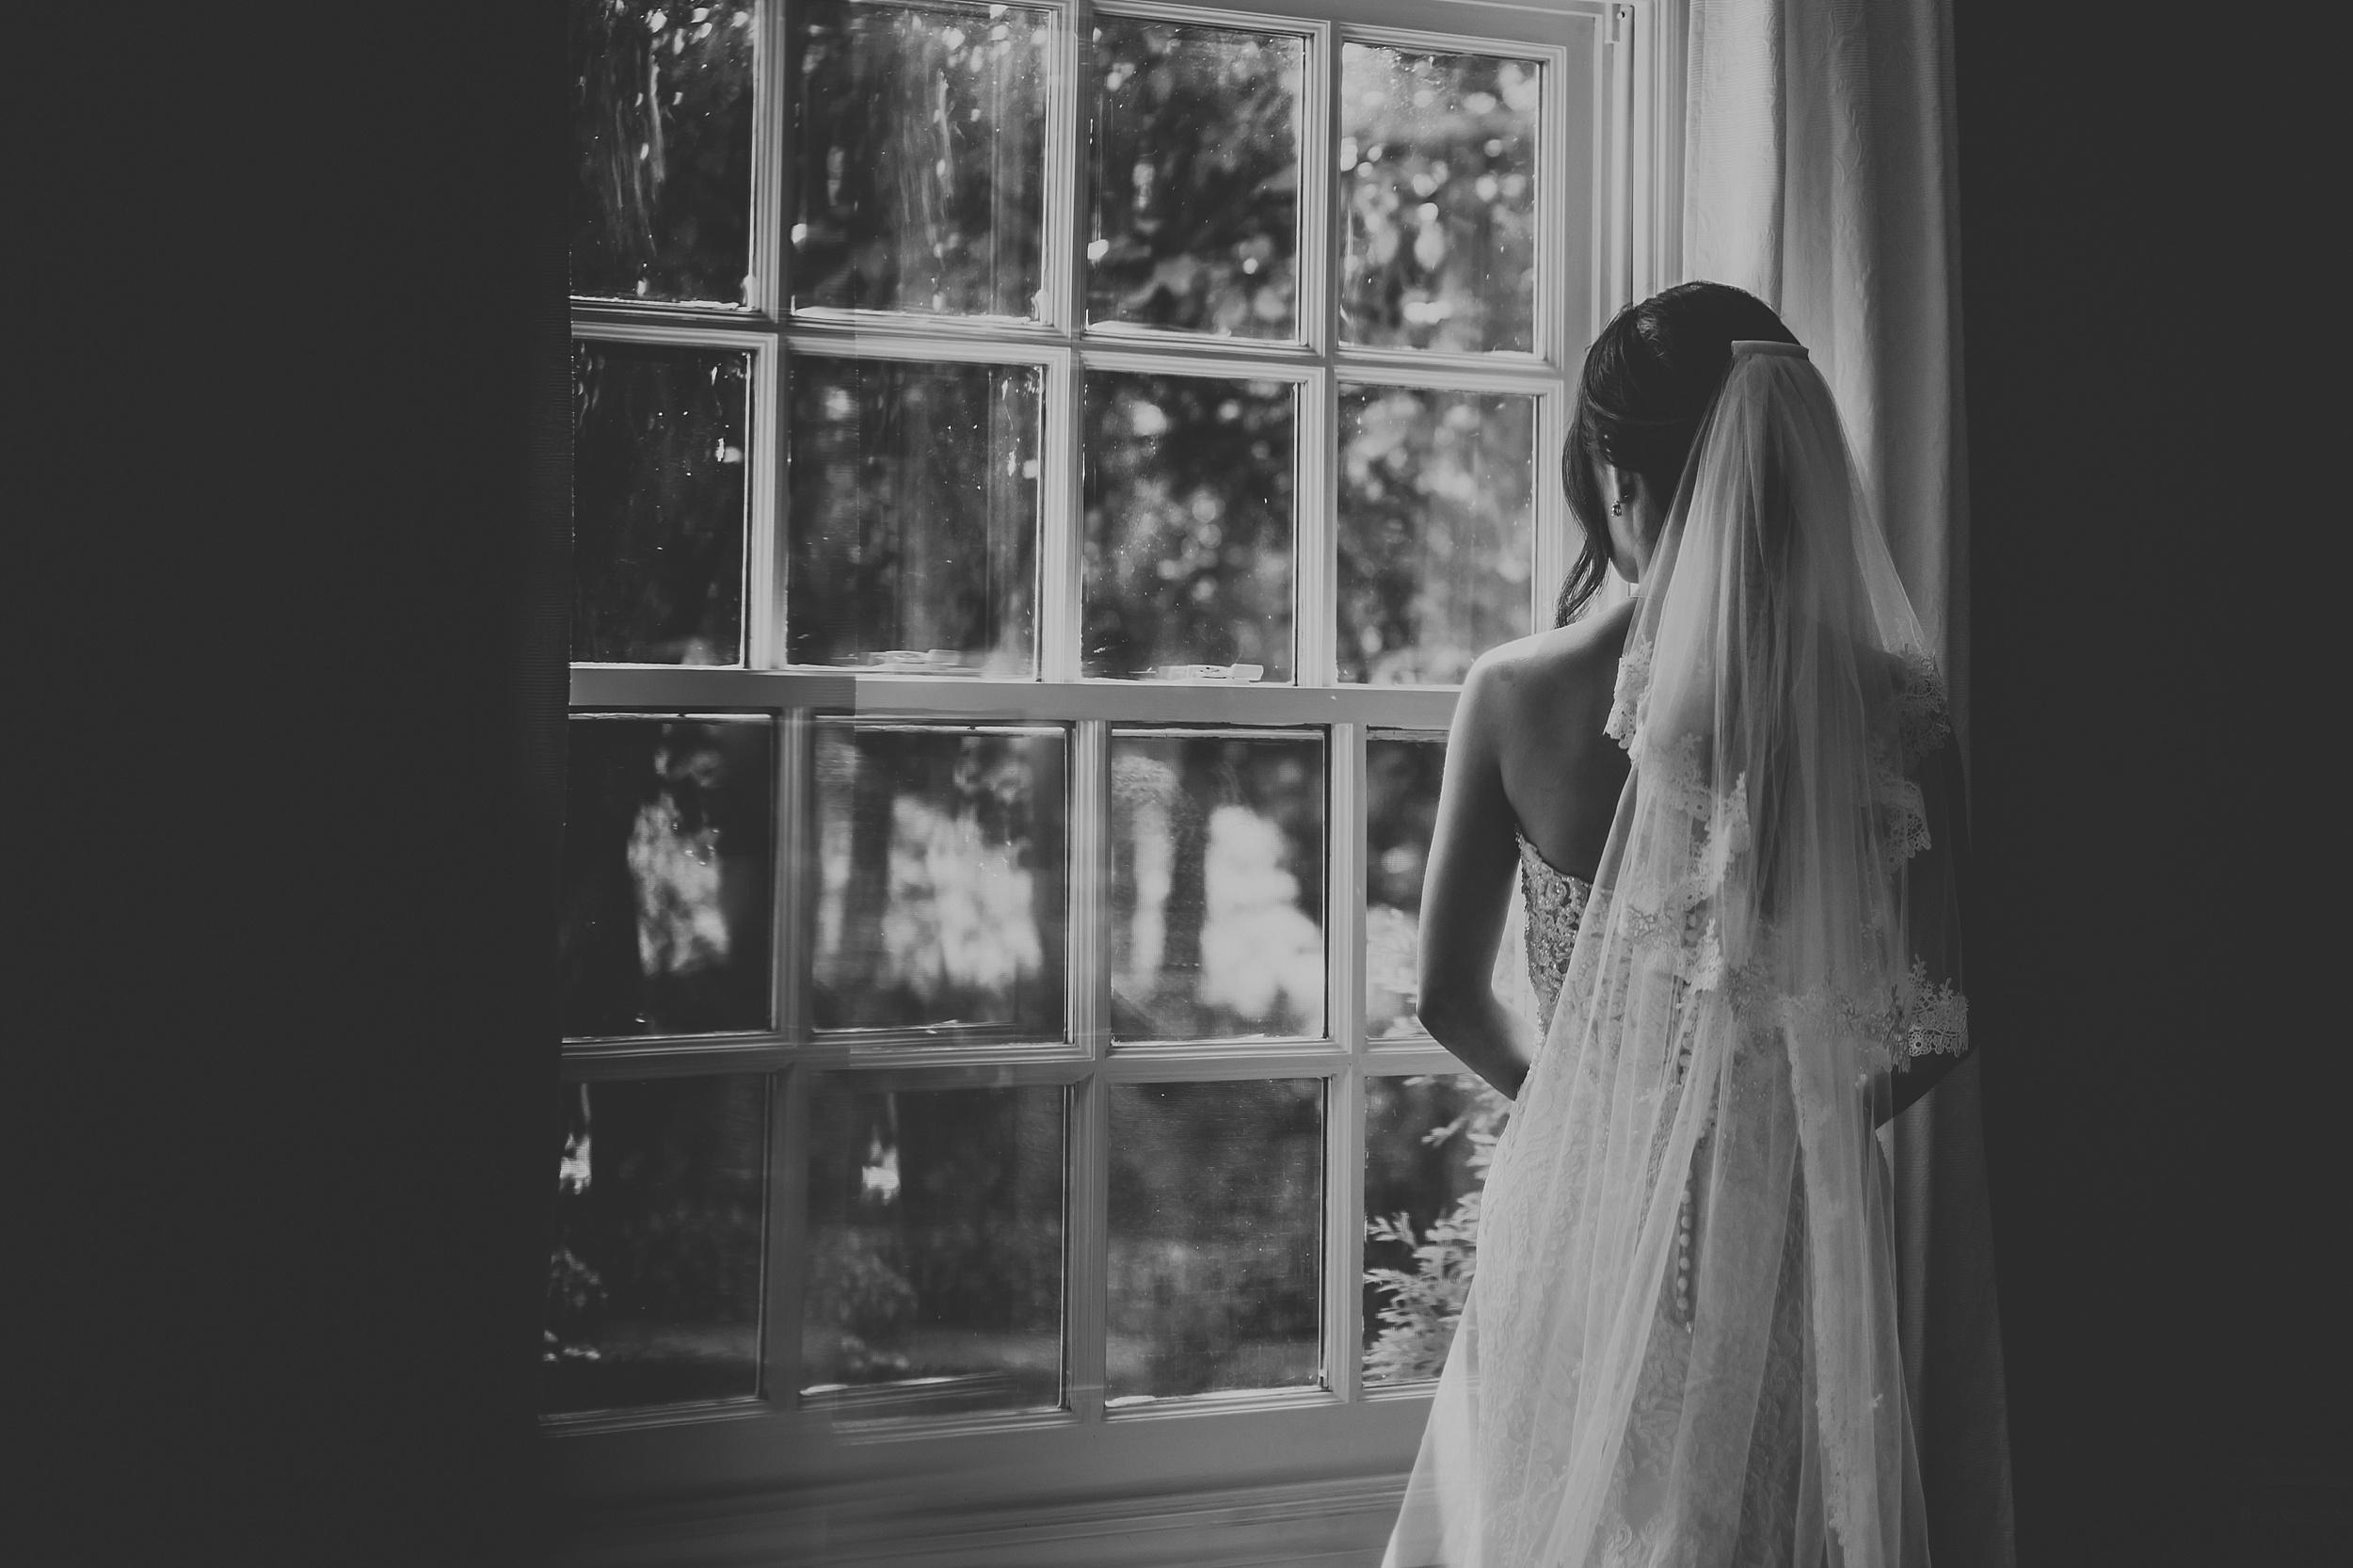 Doctors_House_Kleinburg_Wedding_Toronto_Photographer_0010.jpg